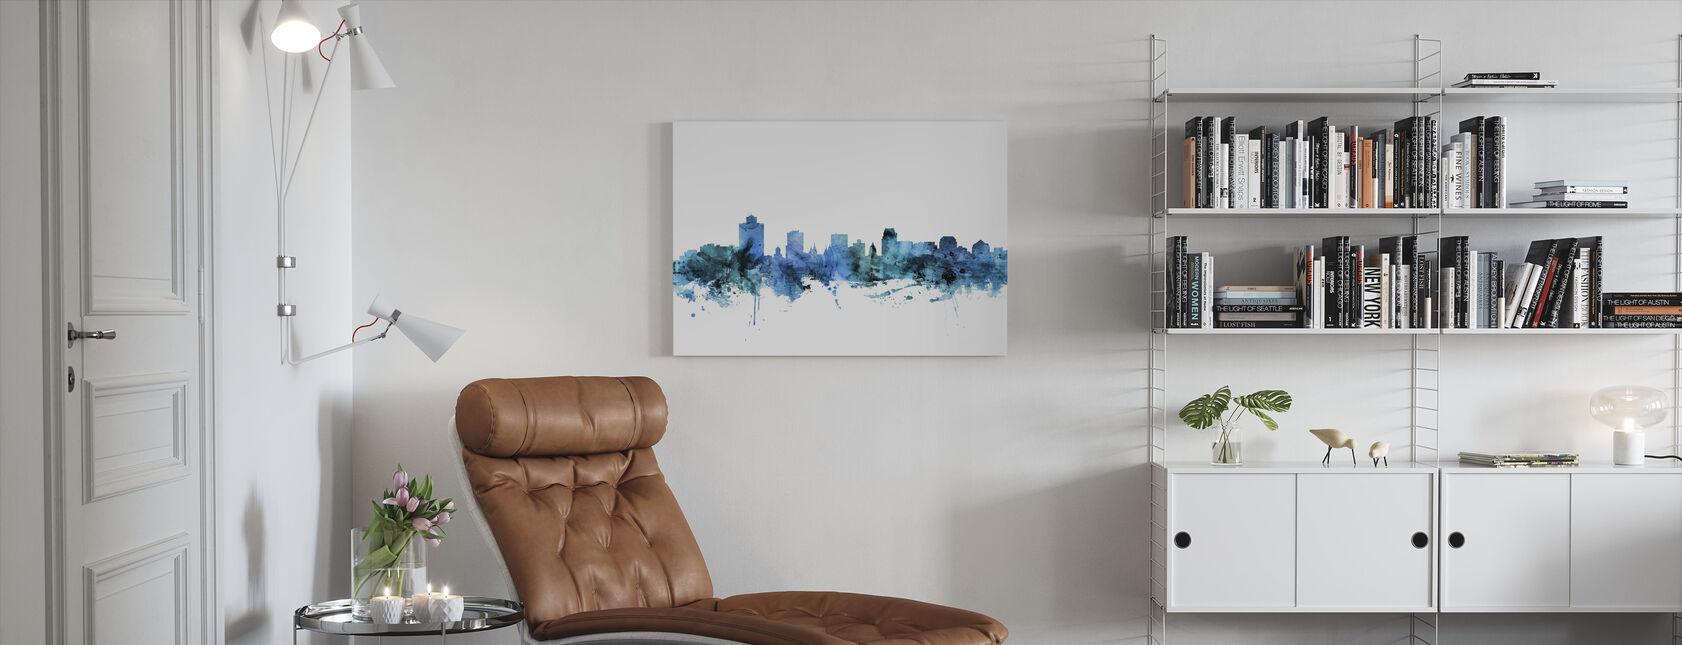 Salt Lake City Utah Skyline - Canvas print - Living Room